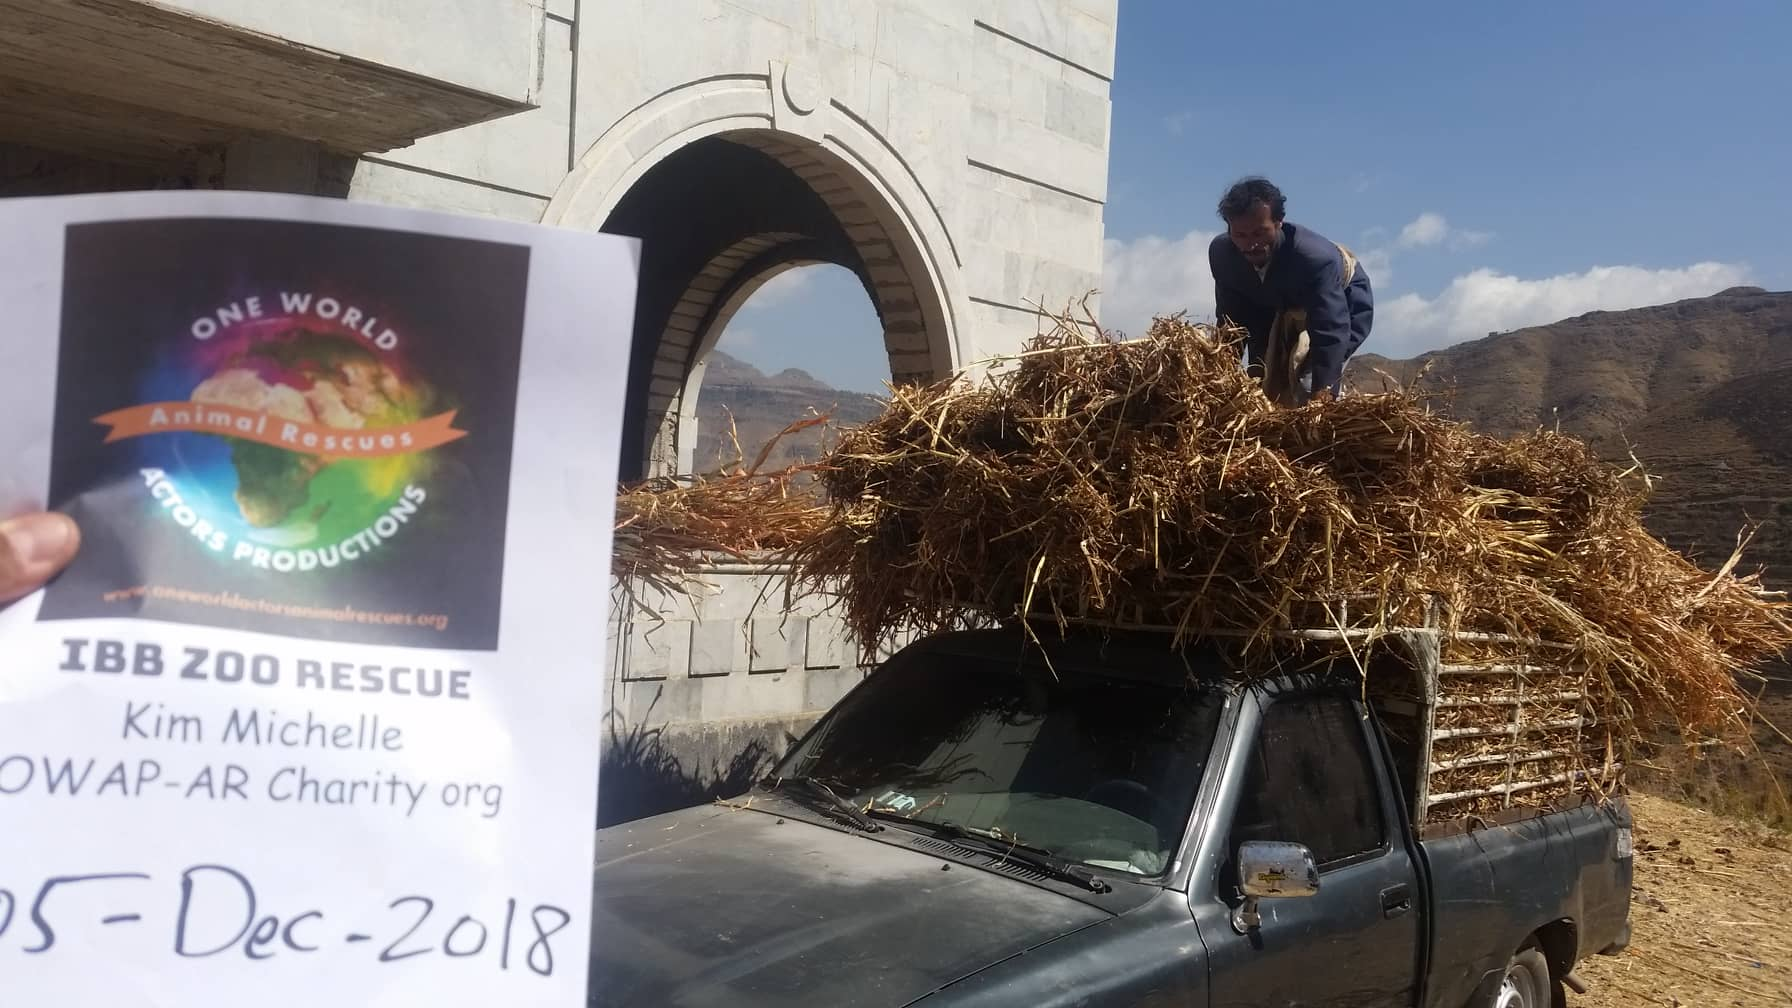 ibb zoo rescue by OWAP-AR yemen 5 dec 2018 zabedi delivering corn sticks  sign Hisham.jpg